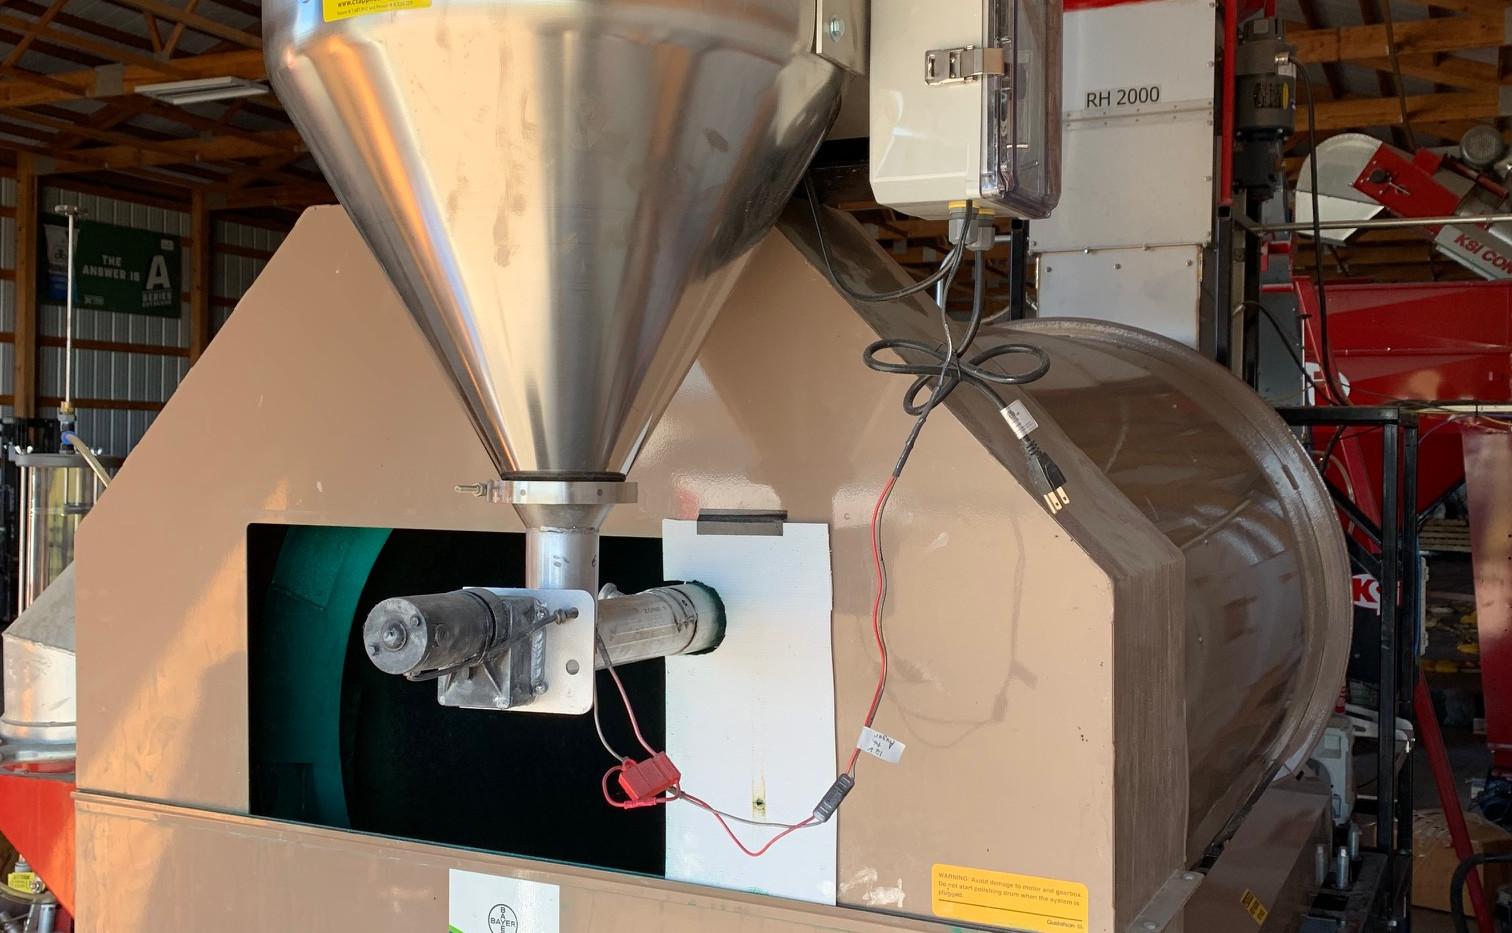 14 gallon offset mount on Bayer